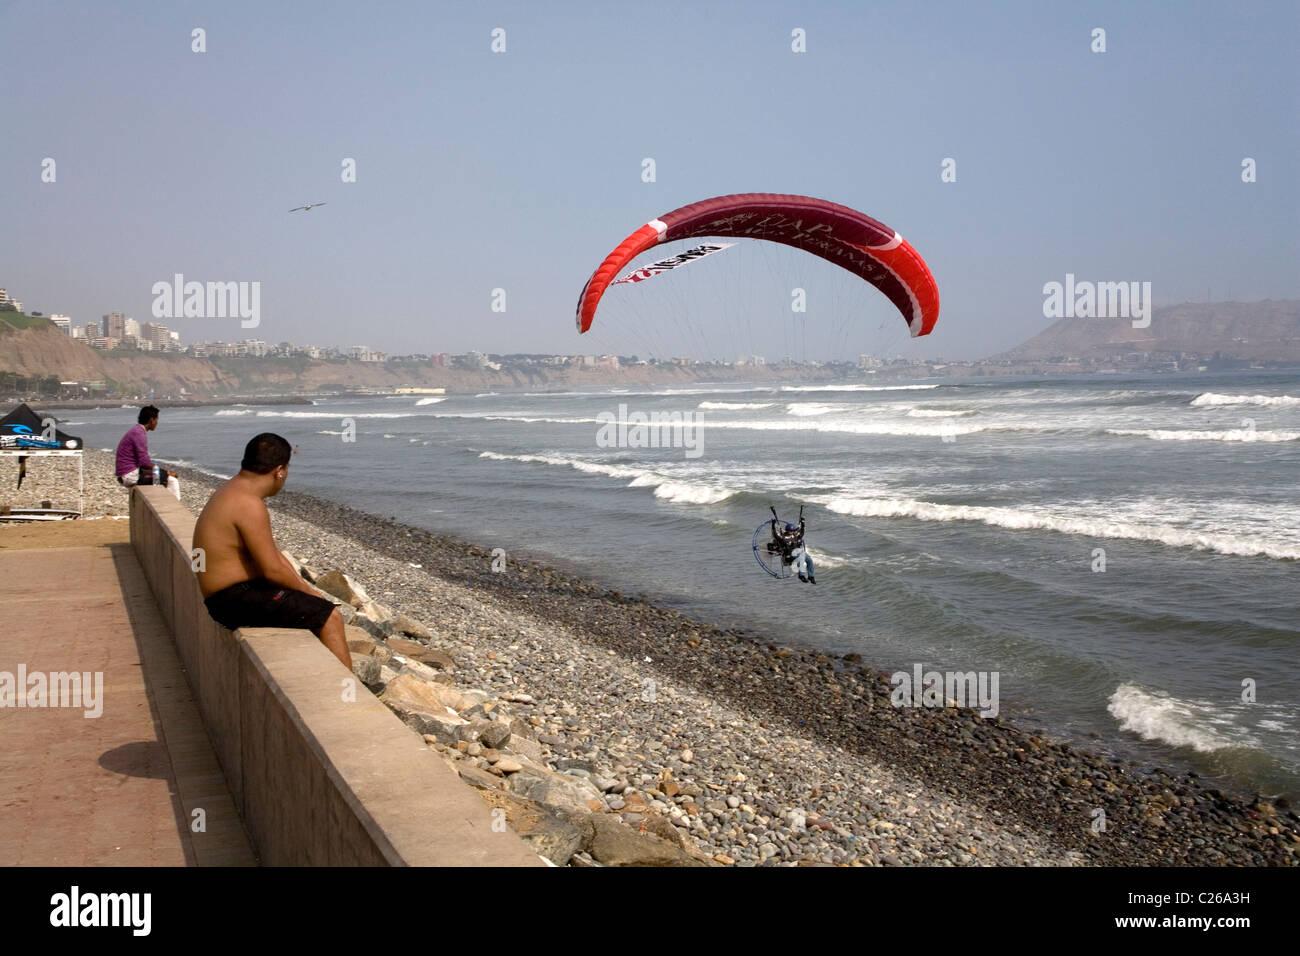 Motor paraglider along the beaches of Miraflores, Lima Peru - Stock Image